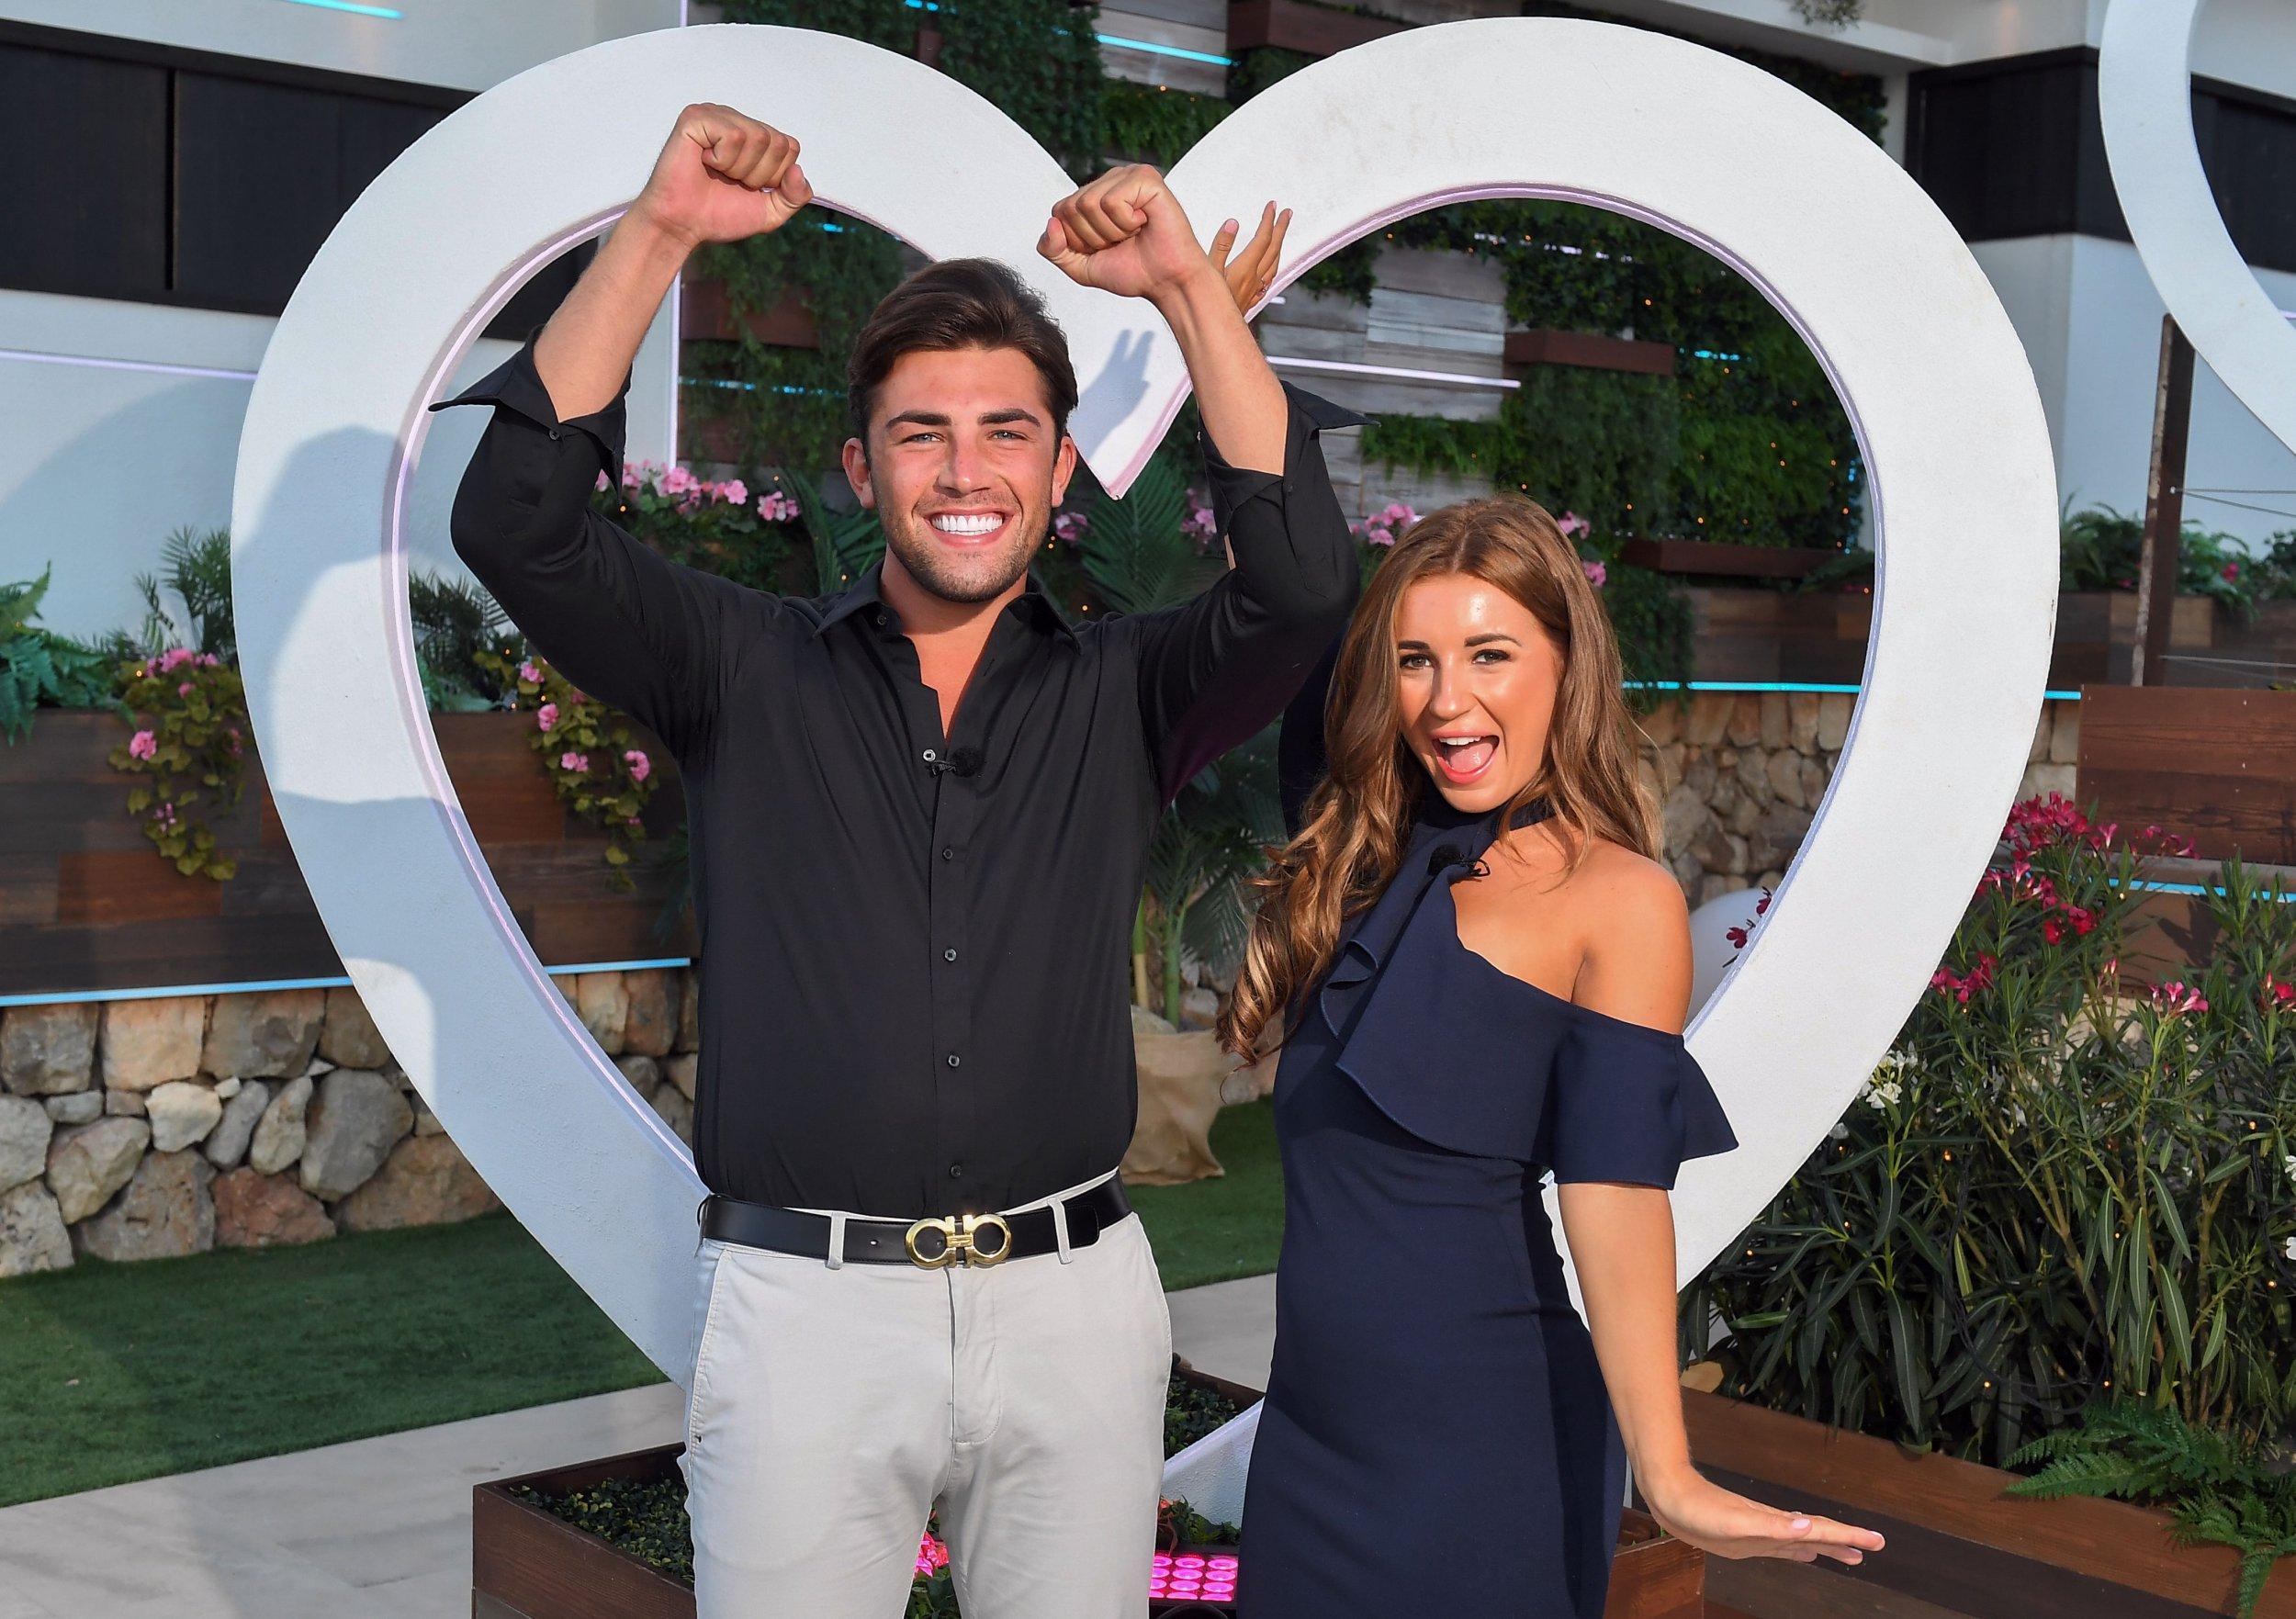 When is Love Island back as ITV confirms season 5 start date?